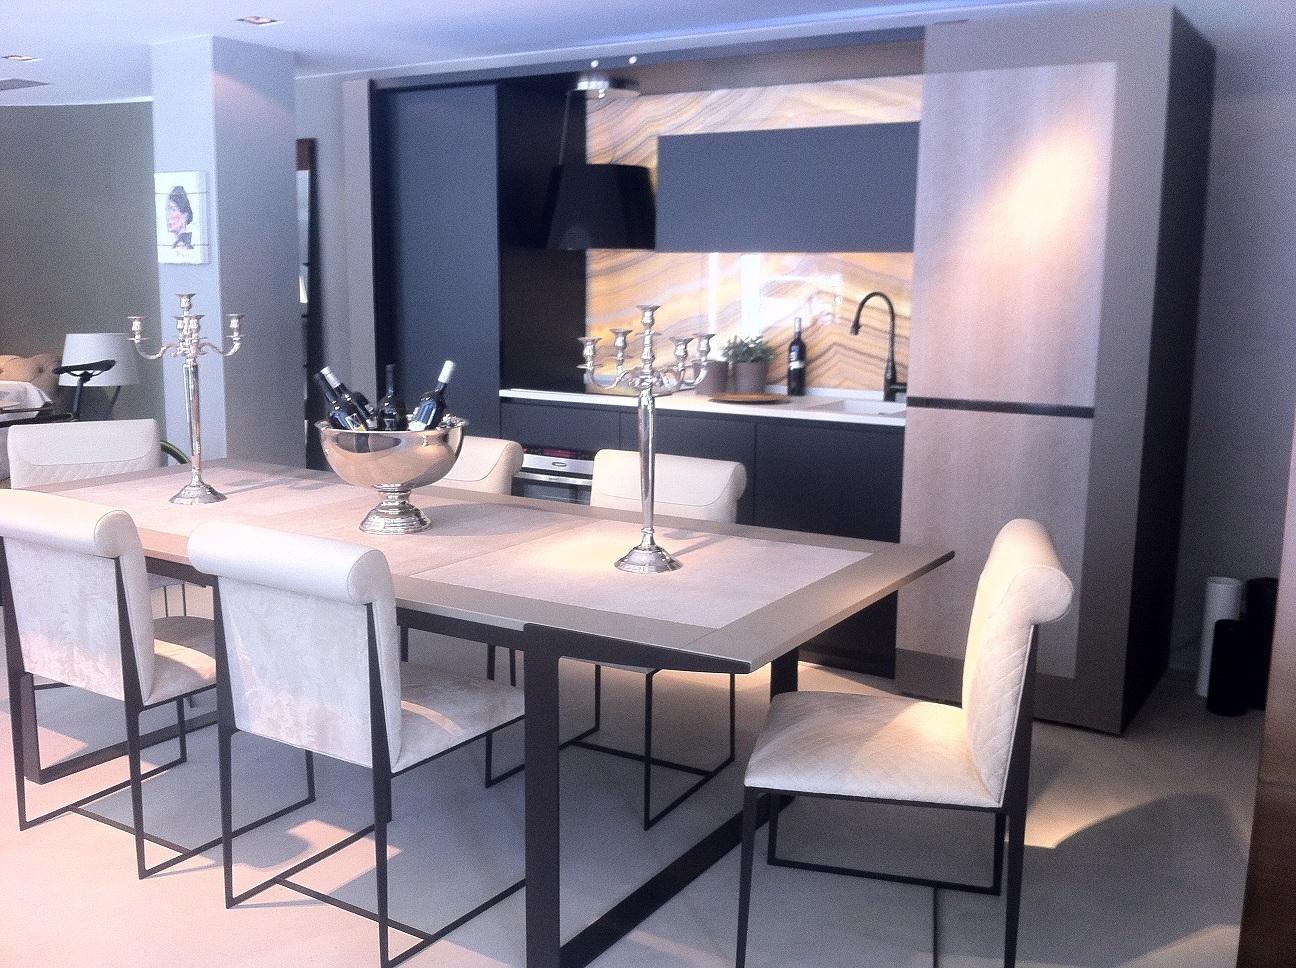 Quintessence cucina electra design   cucine a prezzi scontati